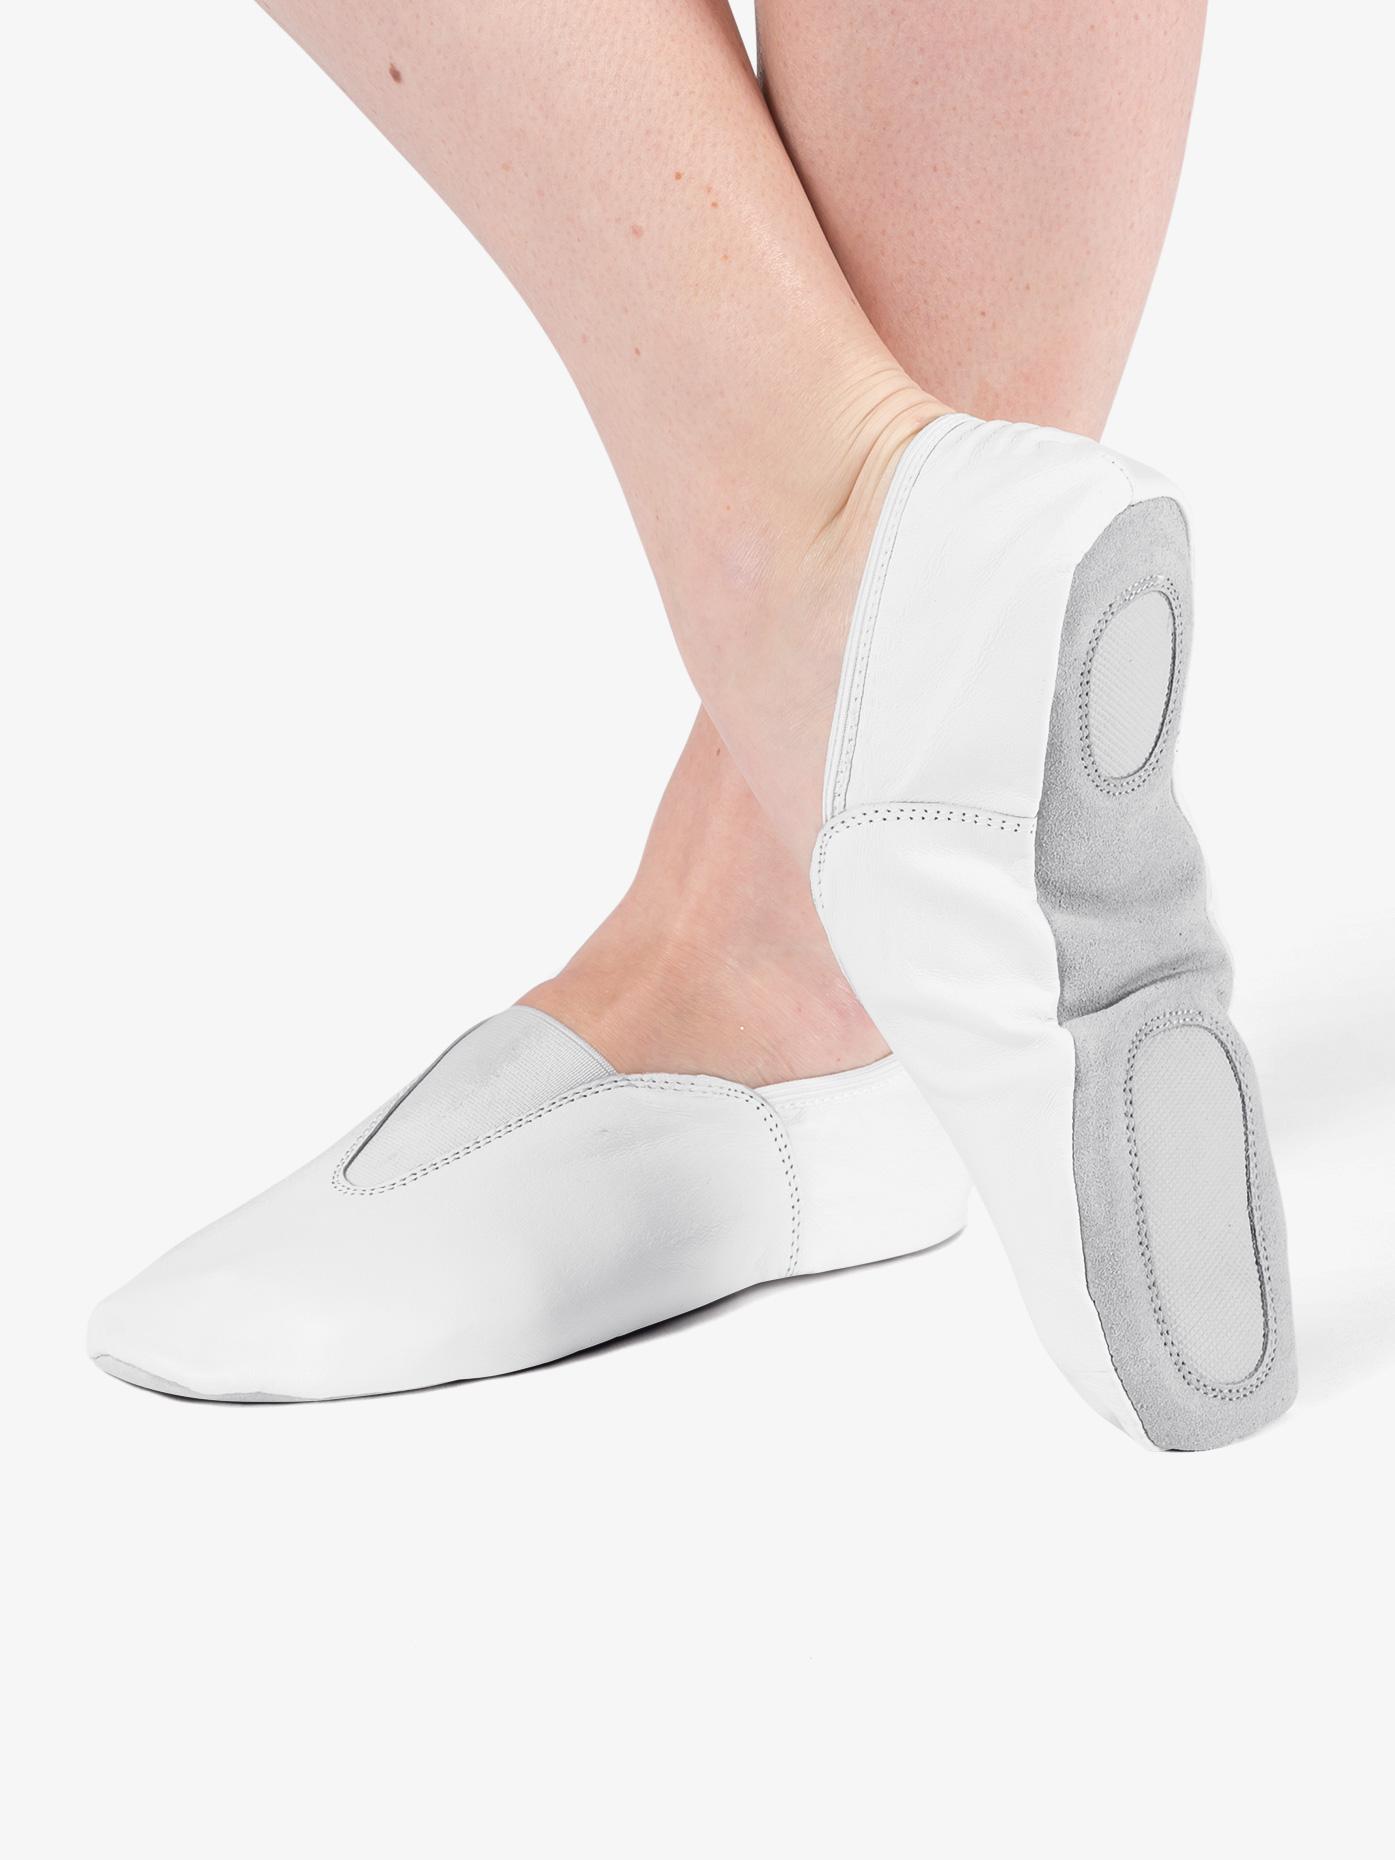 Theatricals Adult Split Sole Gym Shoes T8302